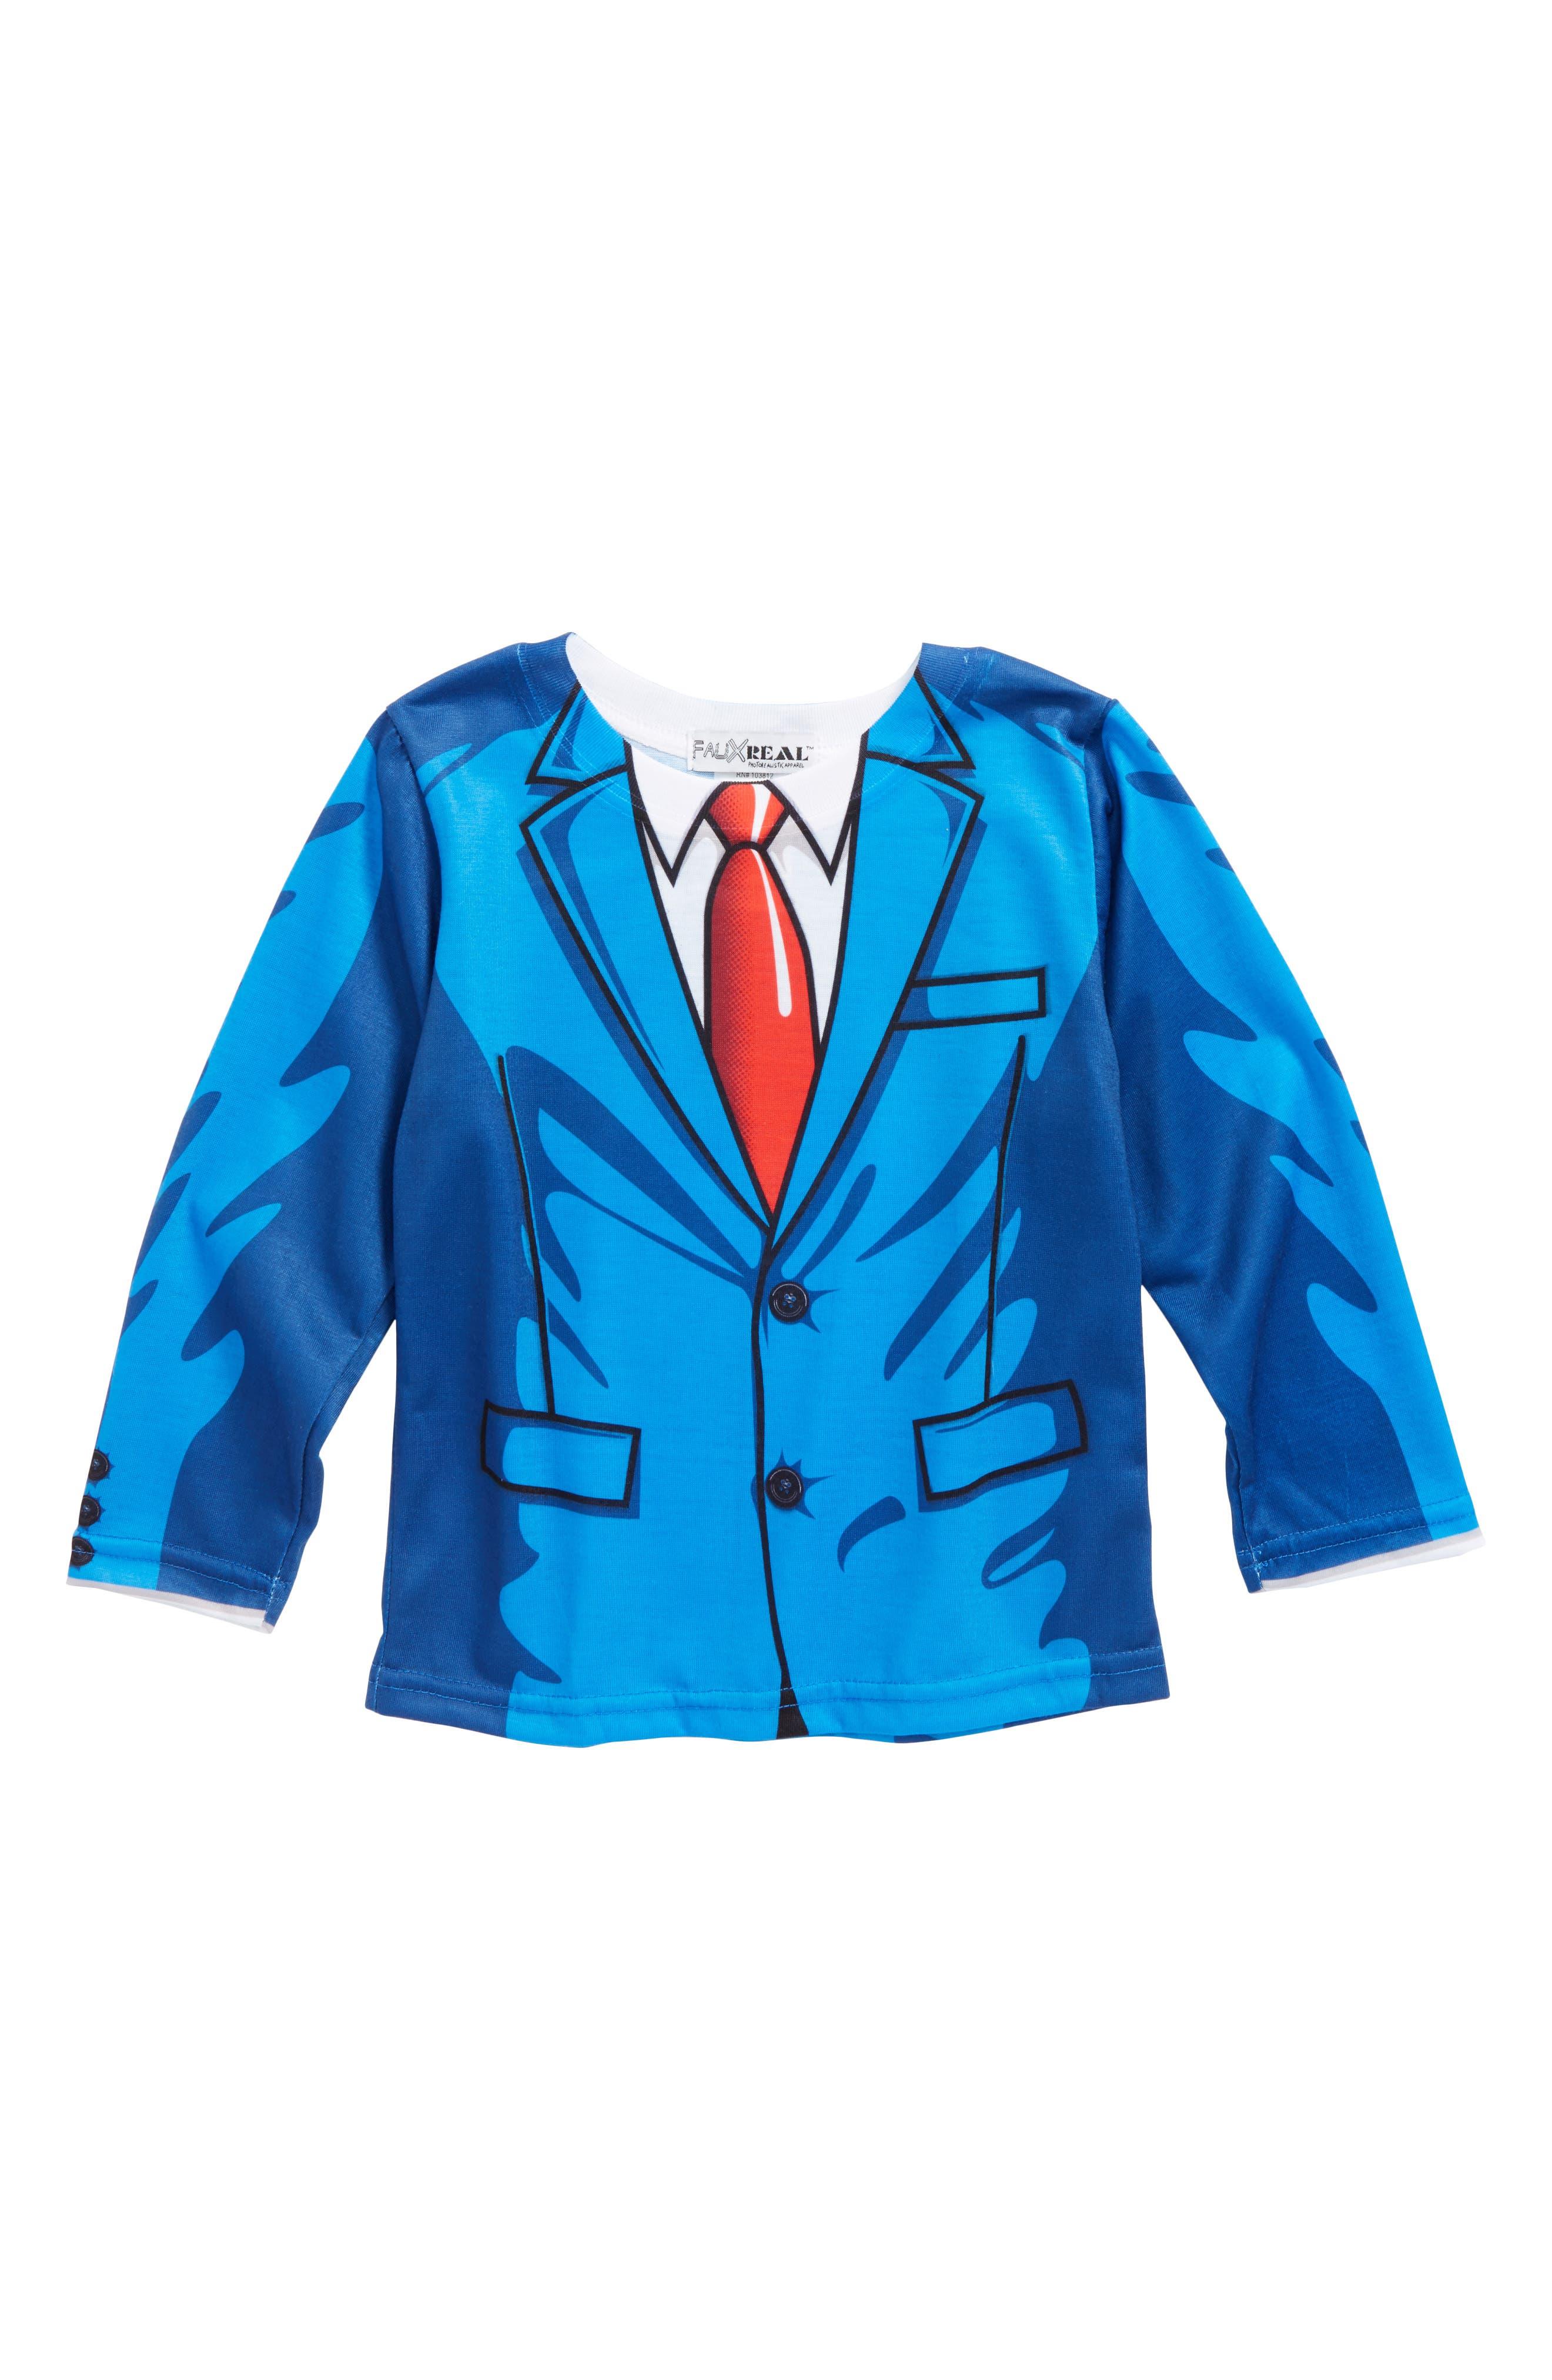 Cartoon Suit Screenprint T-Shirt,                             Main thumbnail 1, color,                             Blue